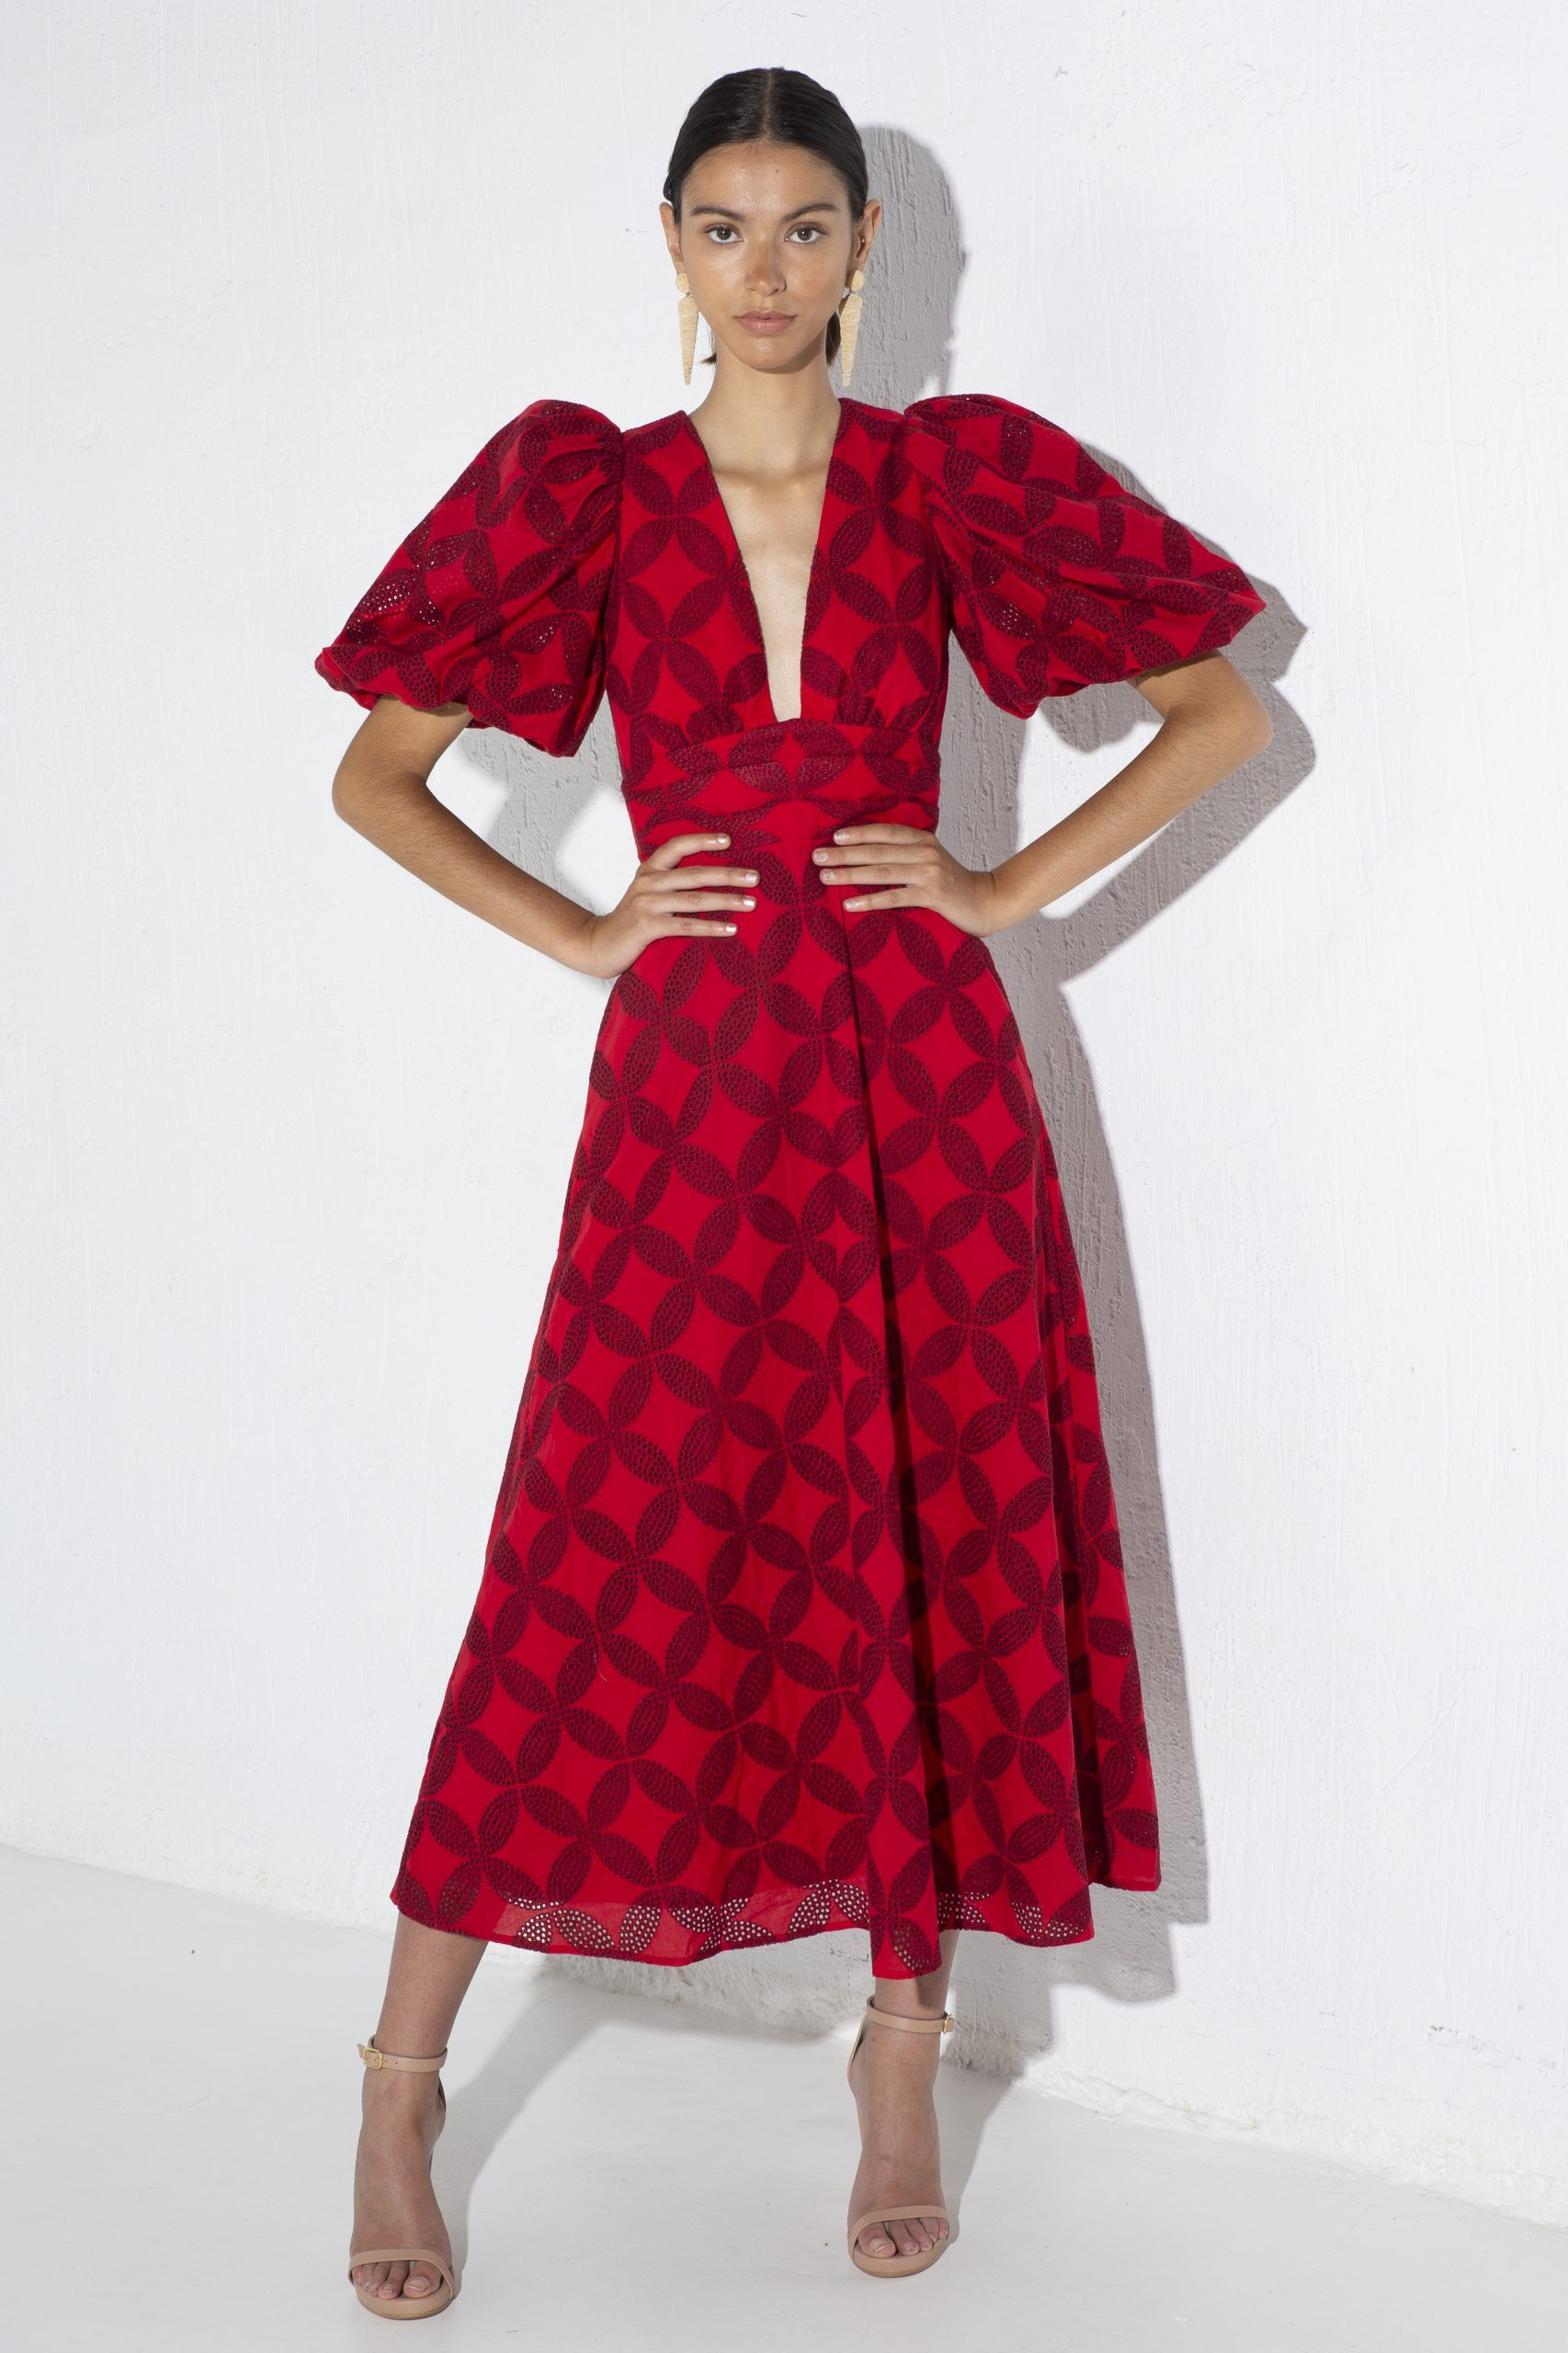 hamilton-acler-vestido-rojo